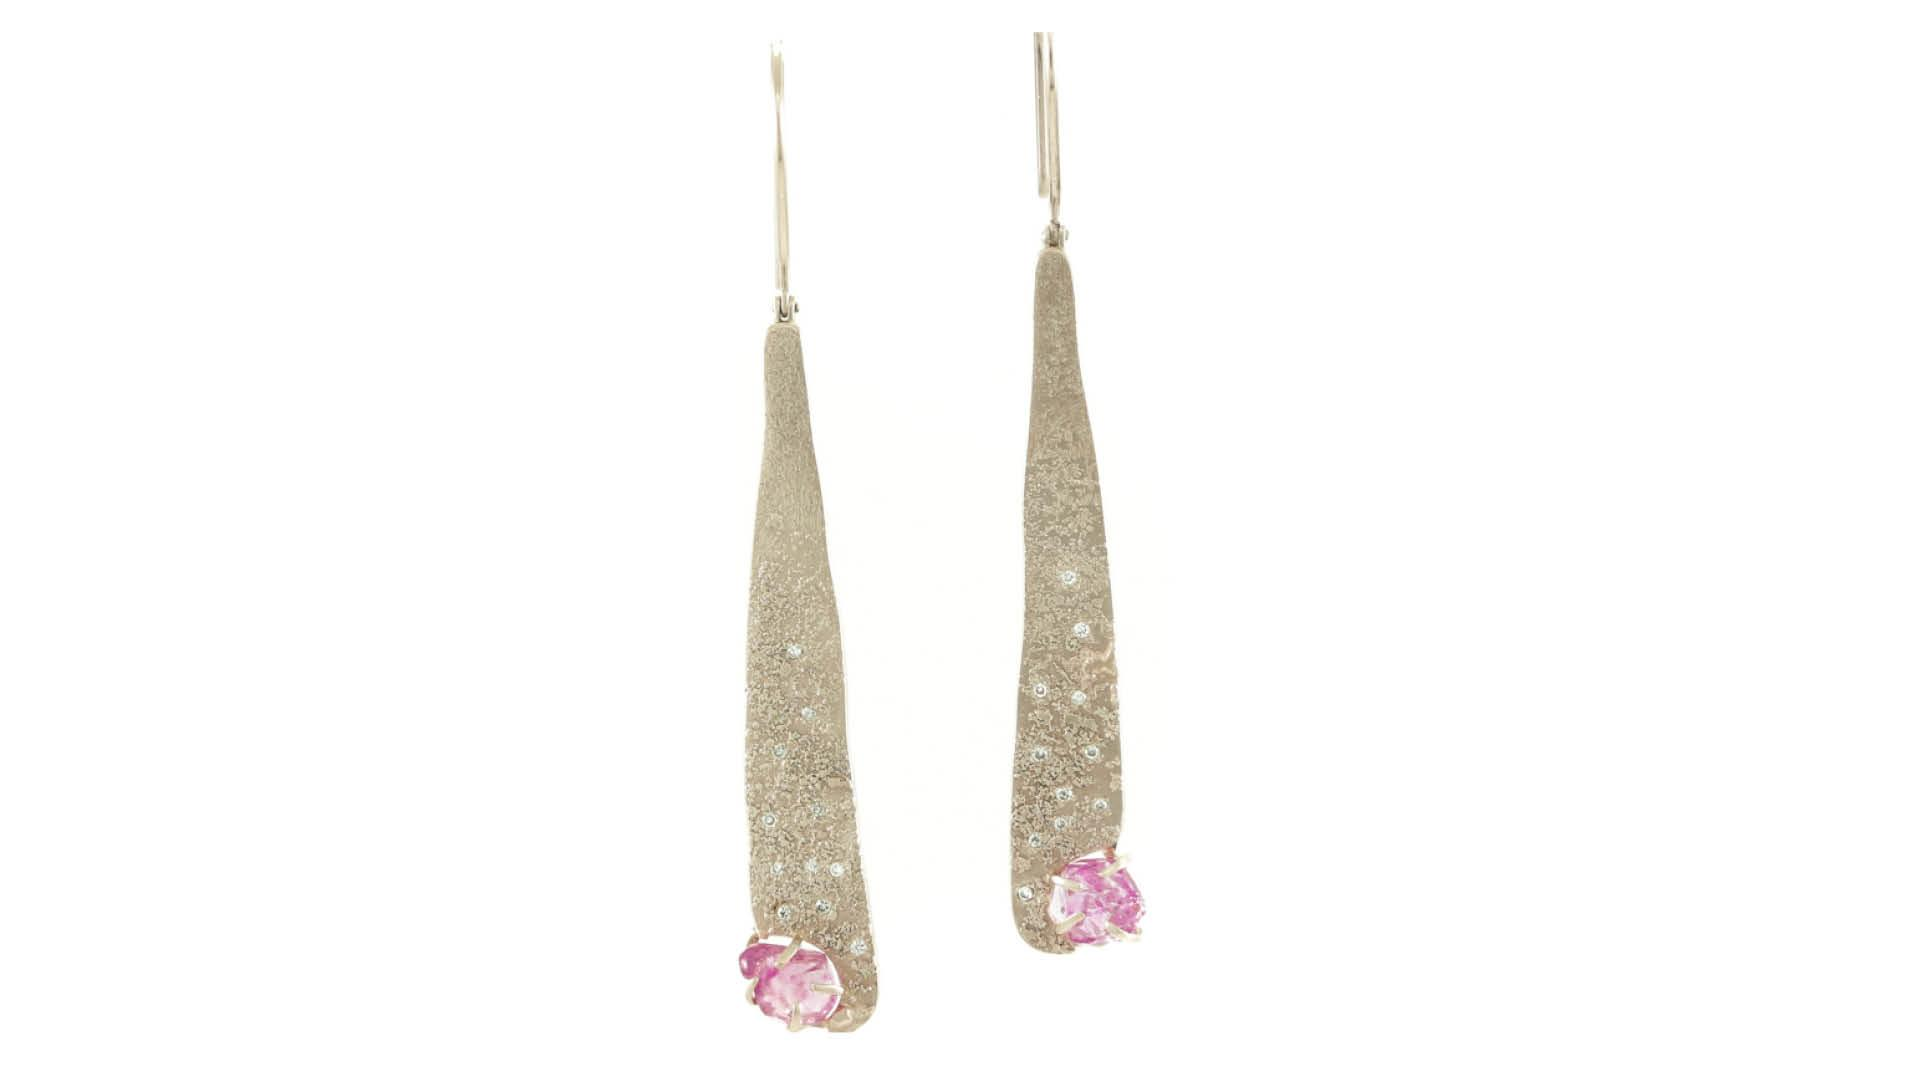 Champagne gold earrings